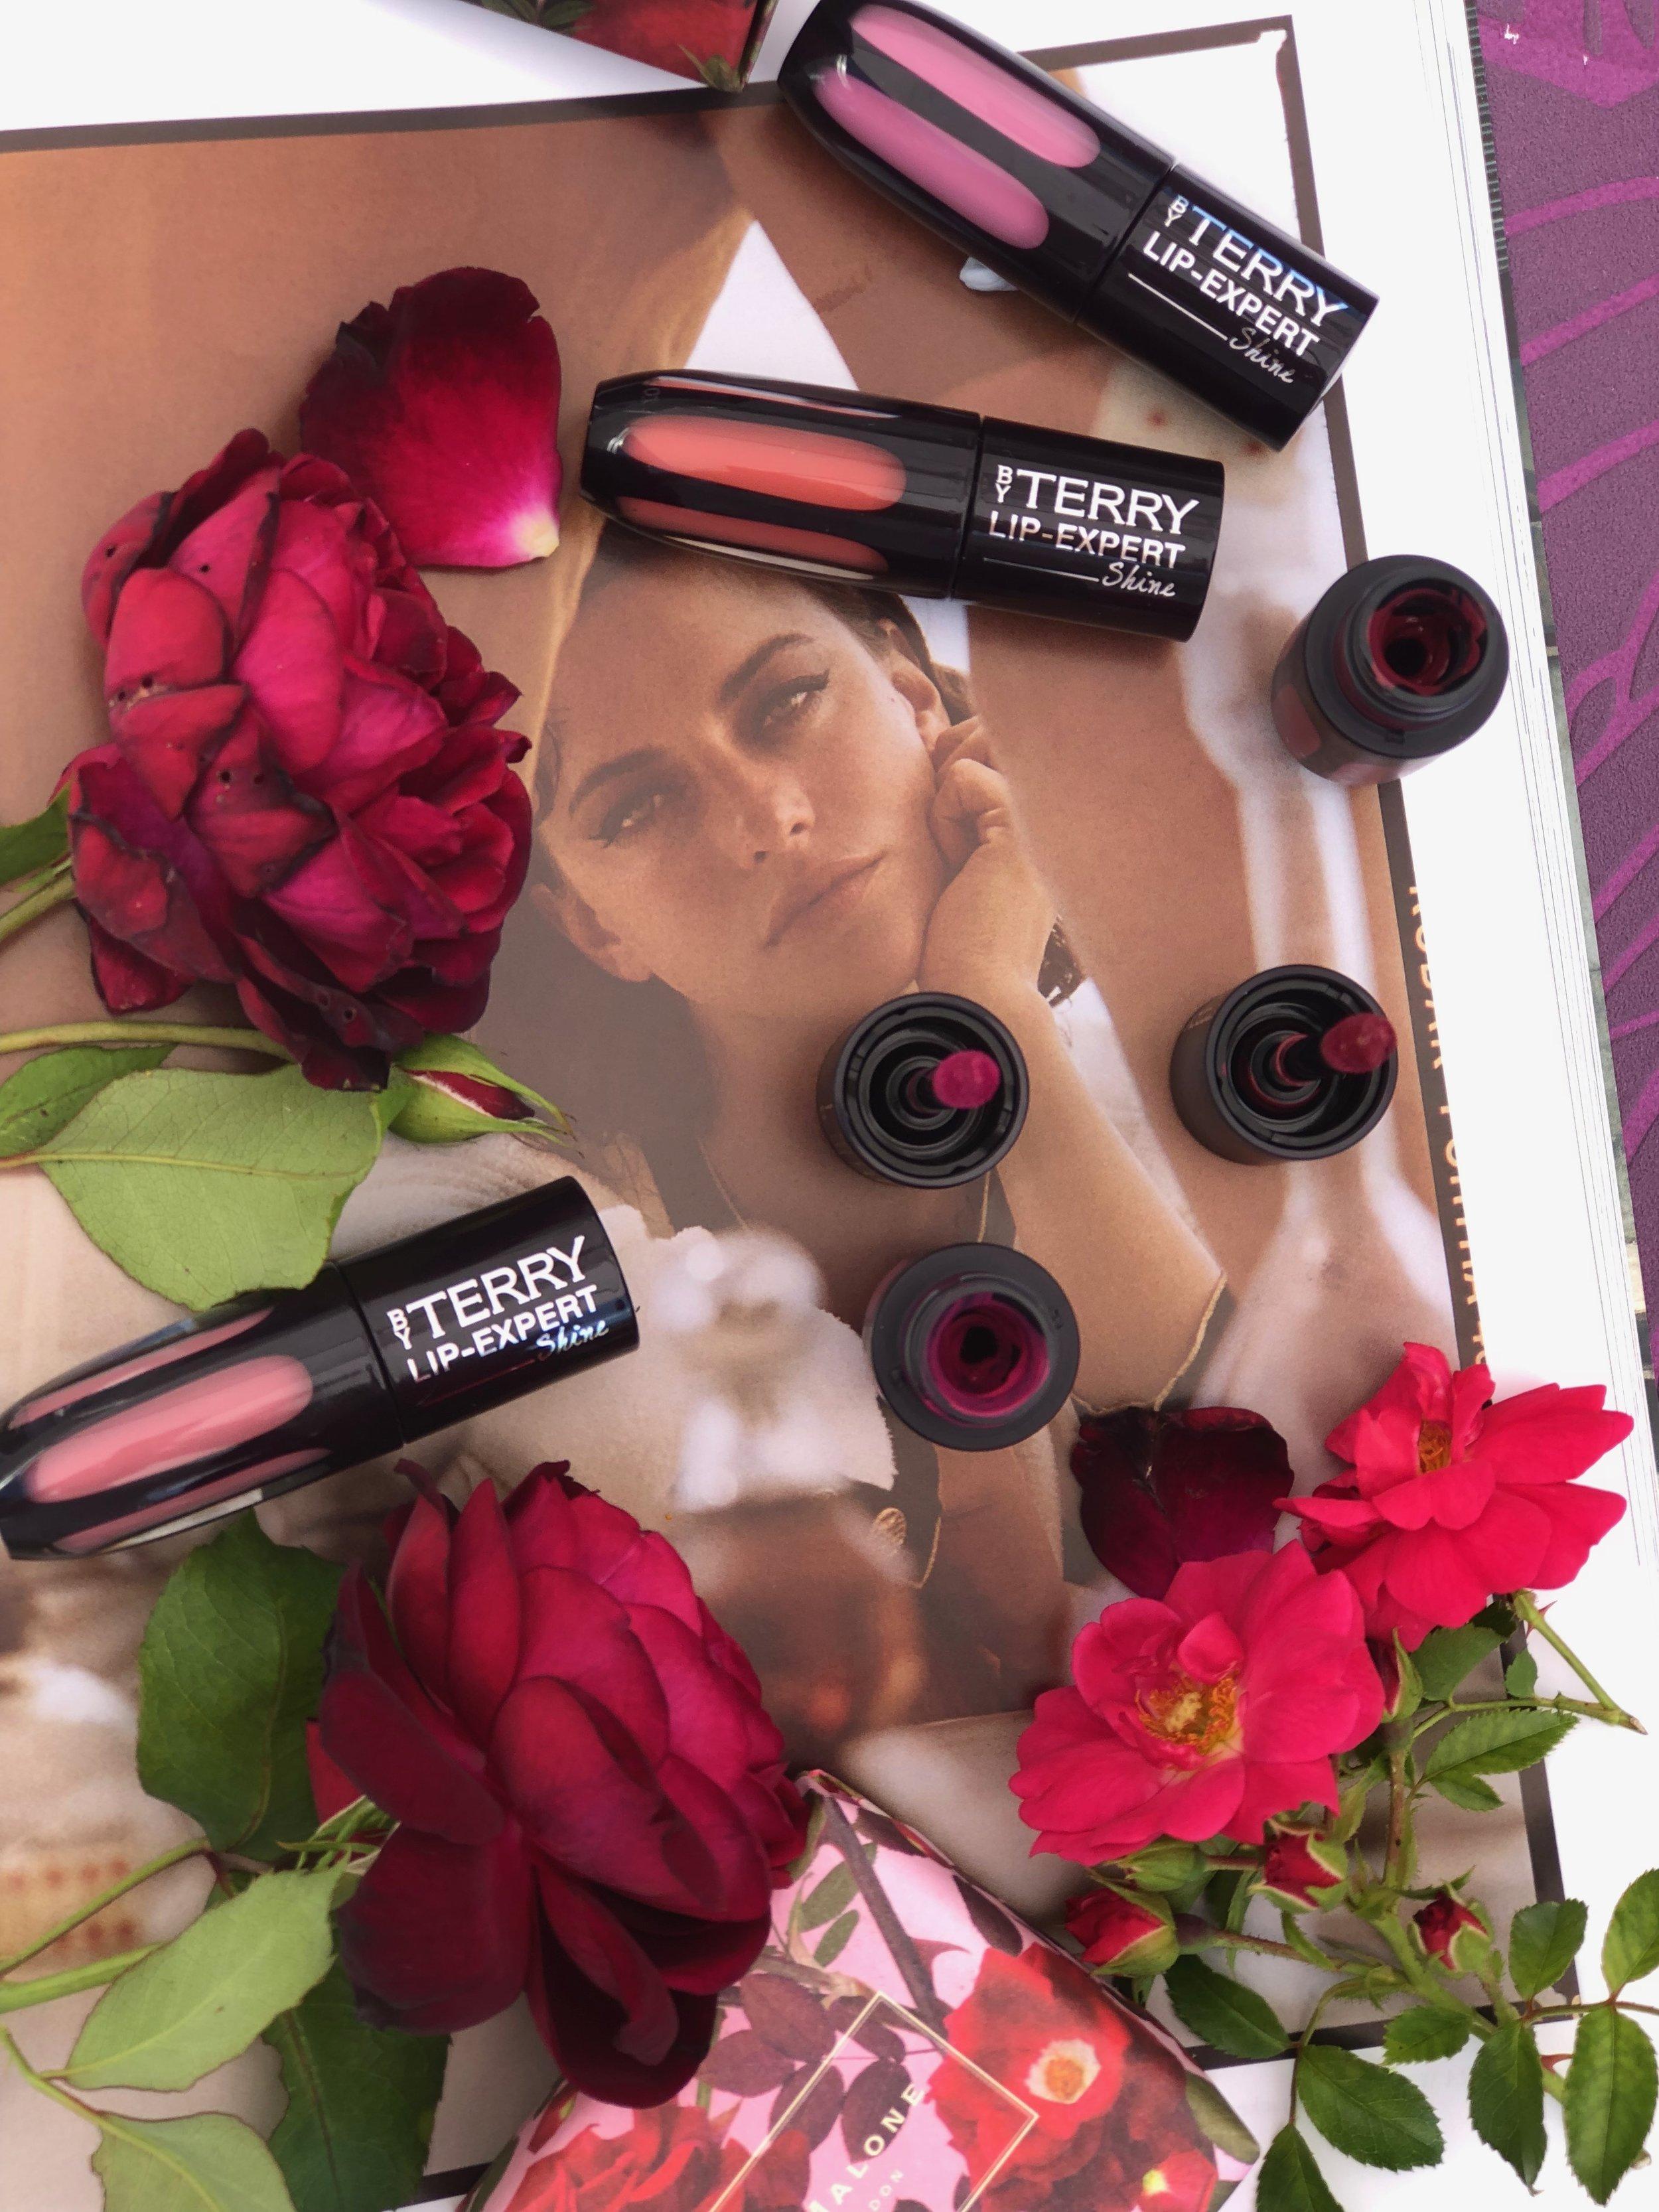 By Terry Lip Expert Liquid Lipstick